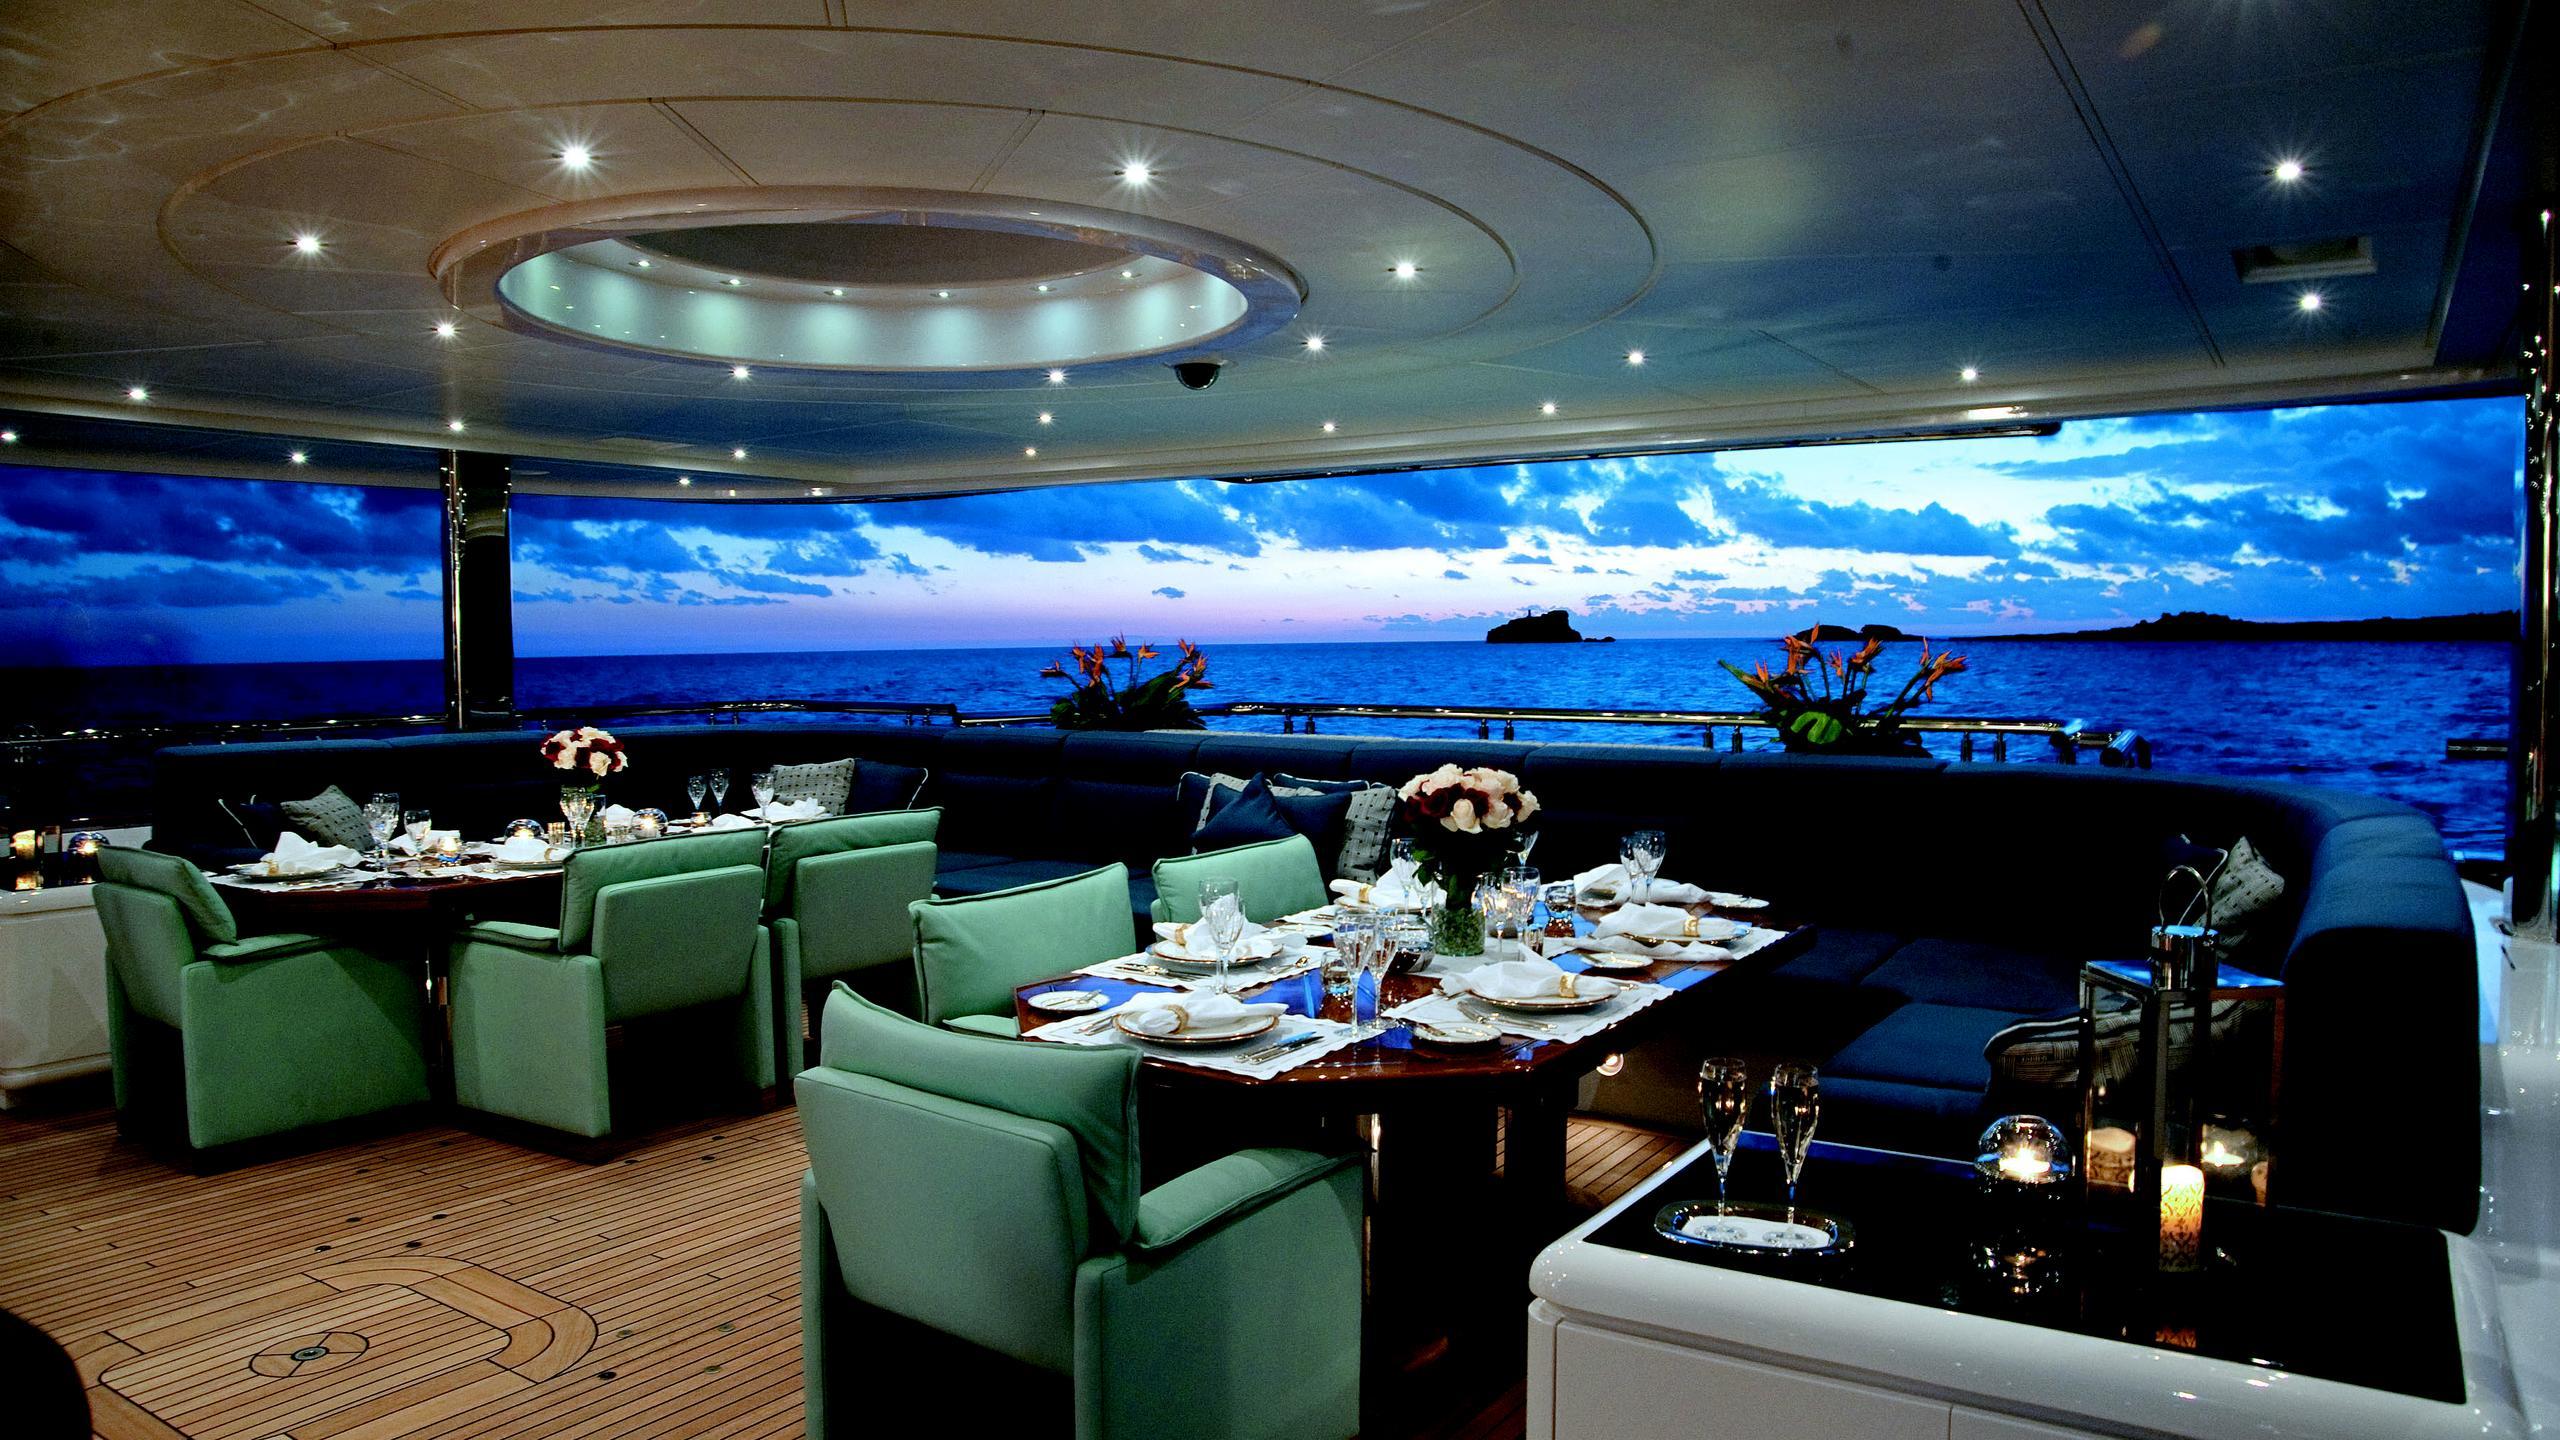 sycara-v-yacht-aft-dining